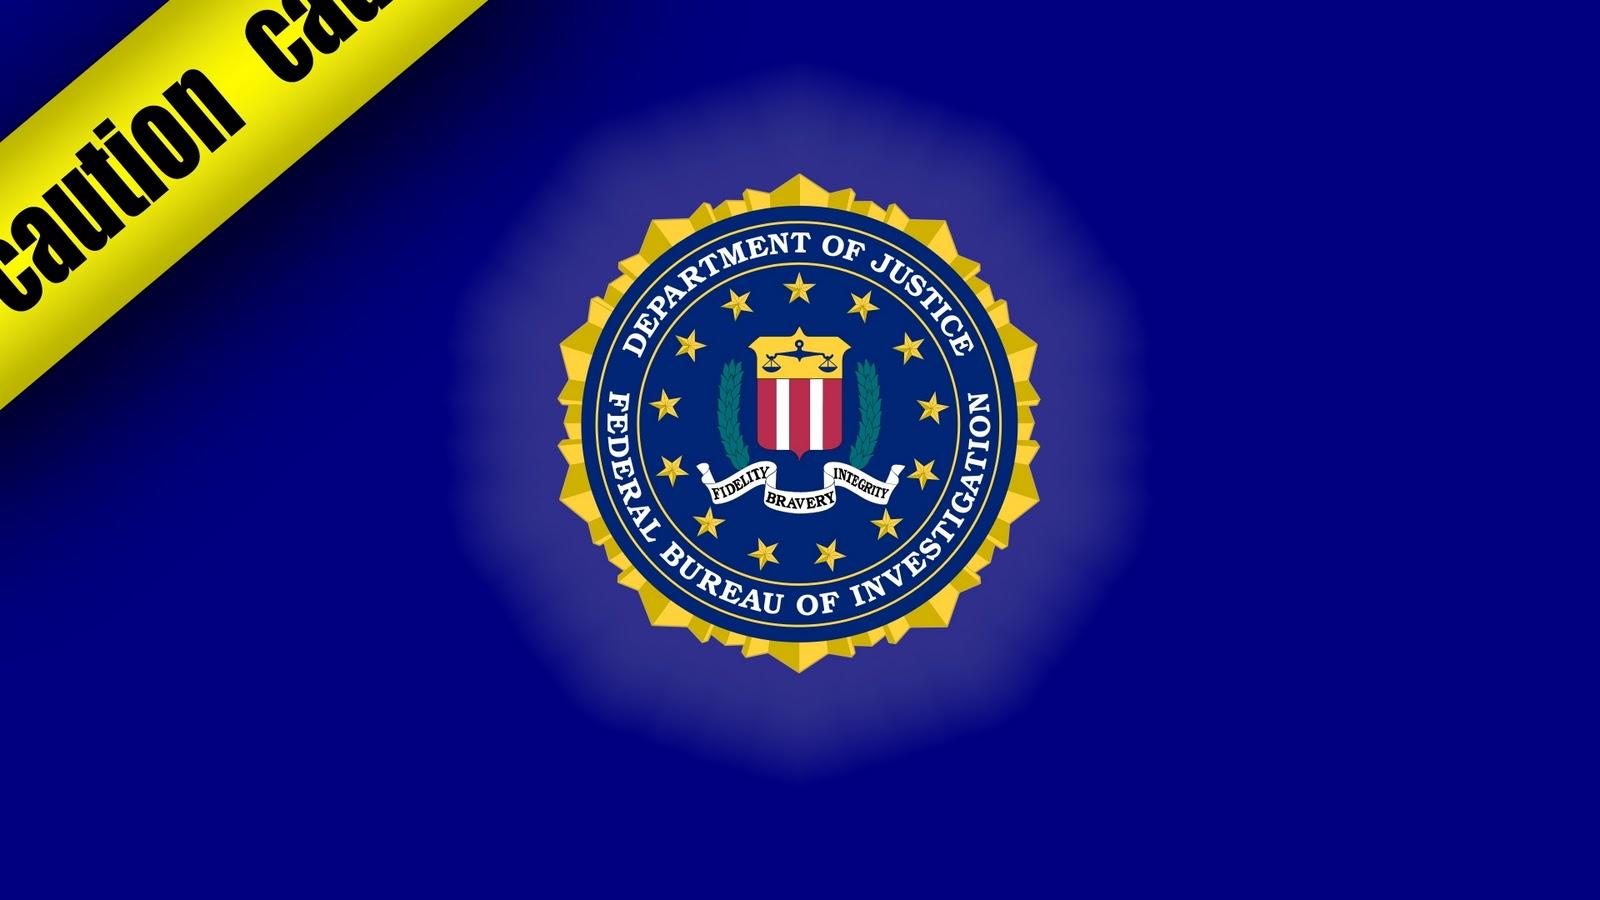 Free Download Phones Fbi Federal Bureau Of Investigation